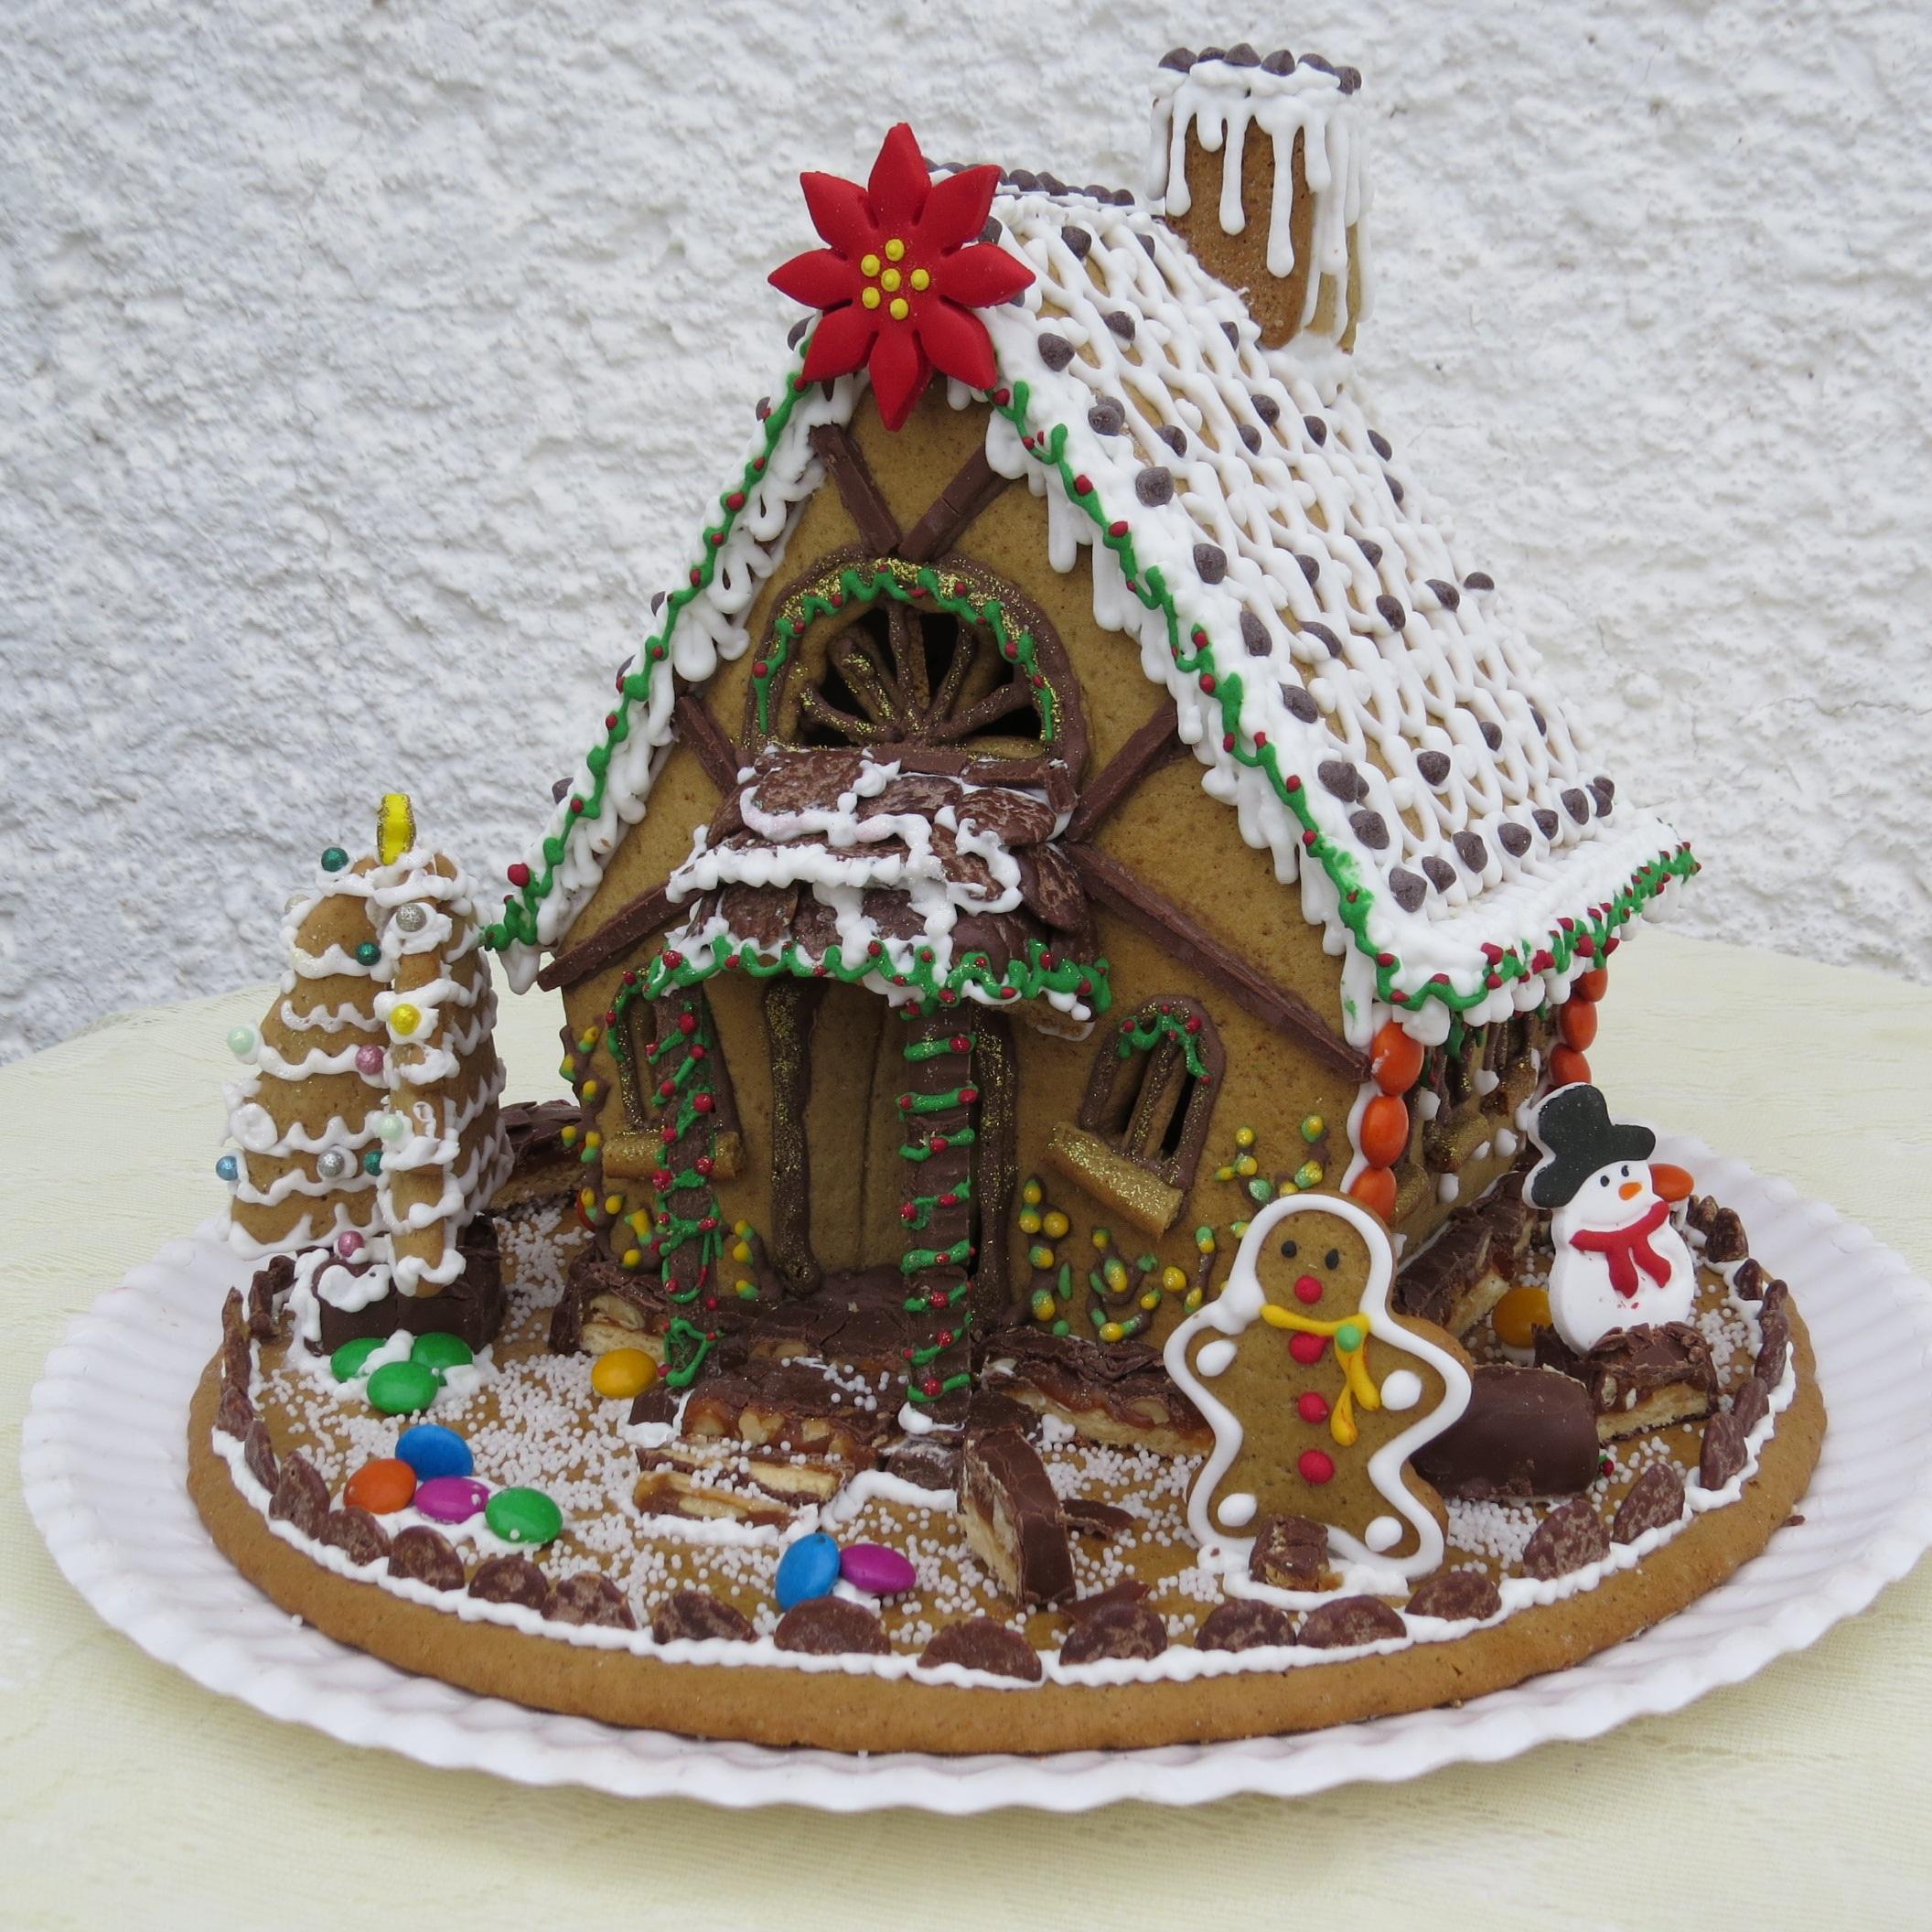 Life Size Christmas Tree Cake